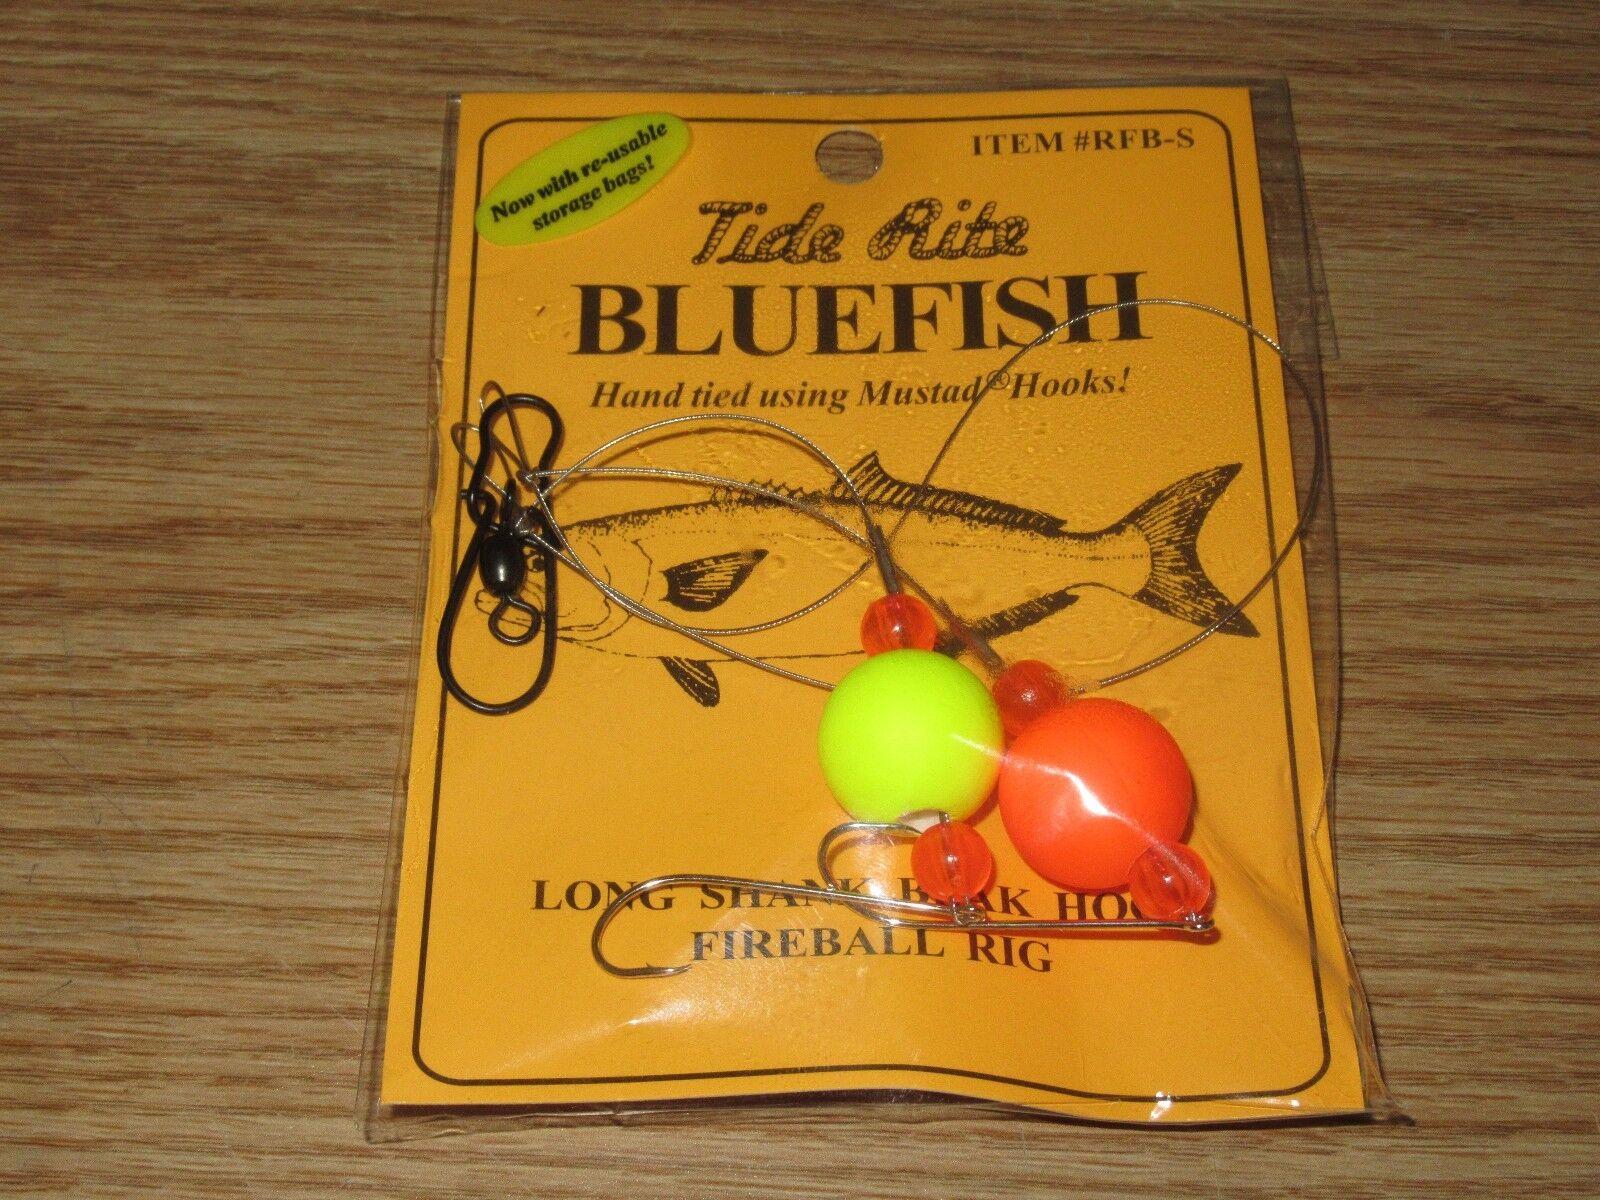 24 blueEFISH TIDE RITE RFB-S BEAK HOOK FIREBALL RIGS SALTWATER FISH RIG MUSTAD